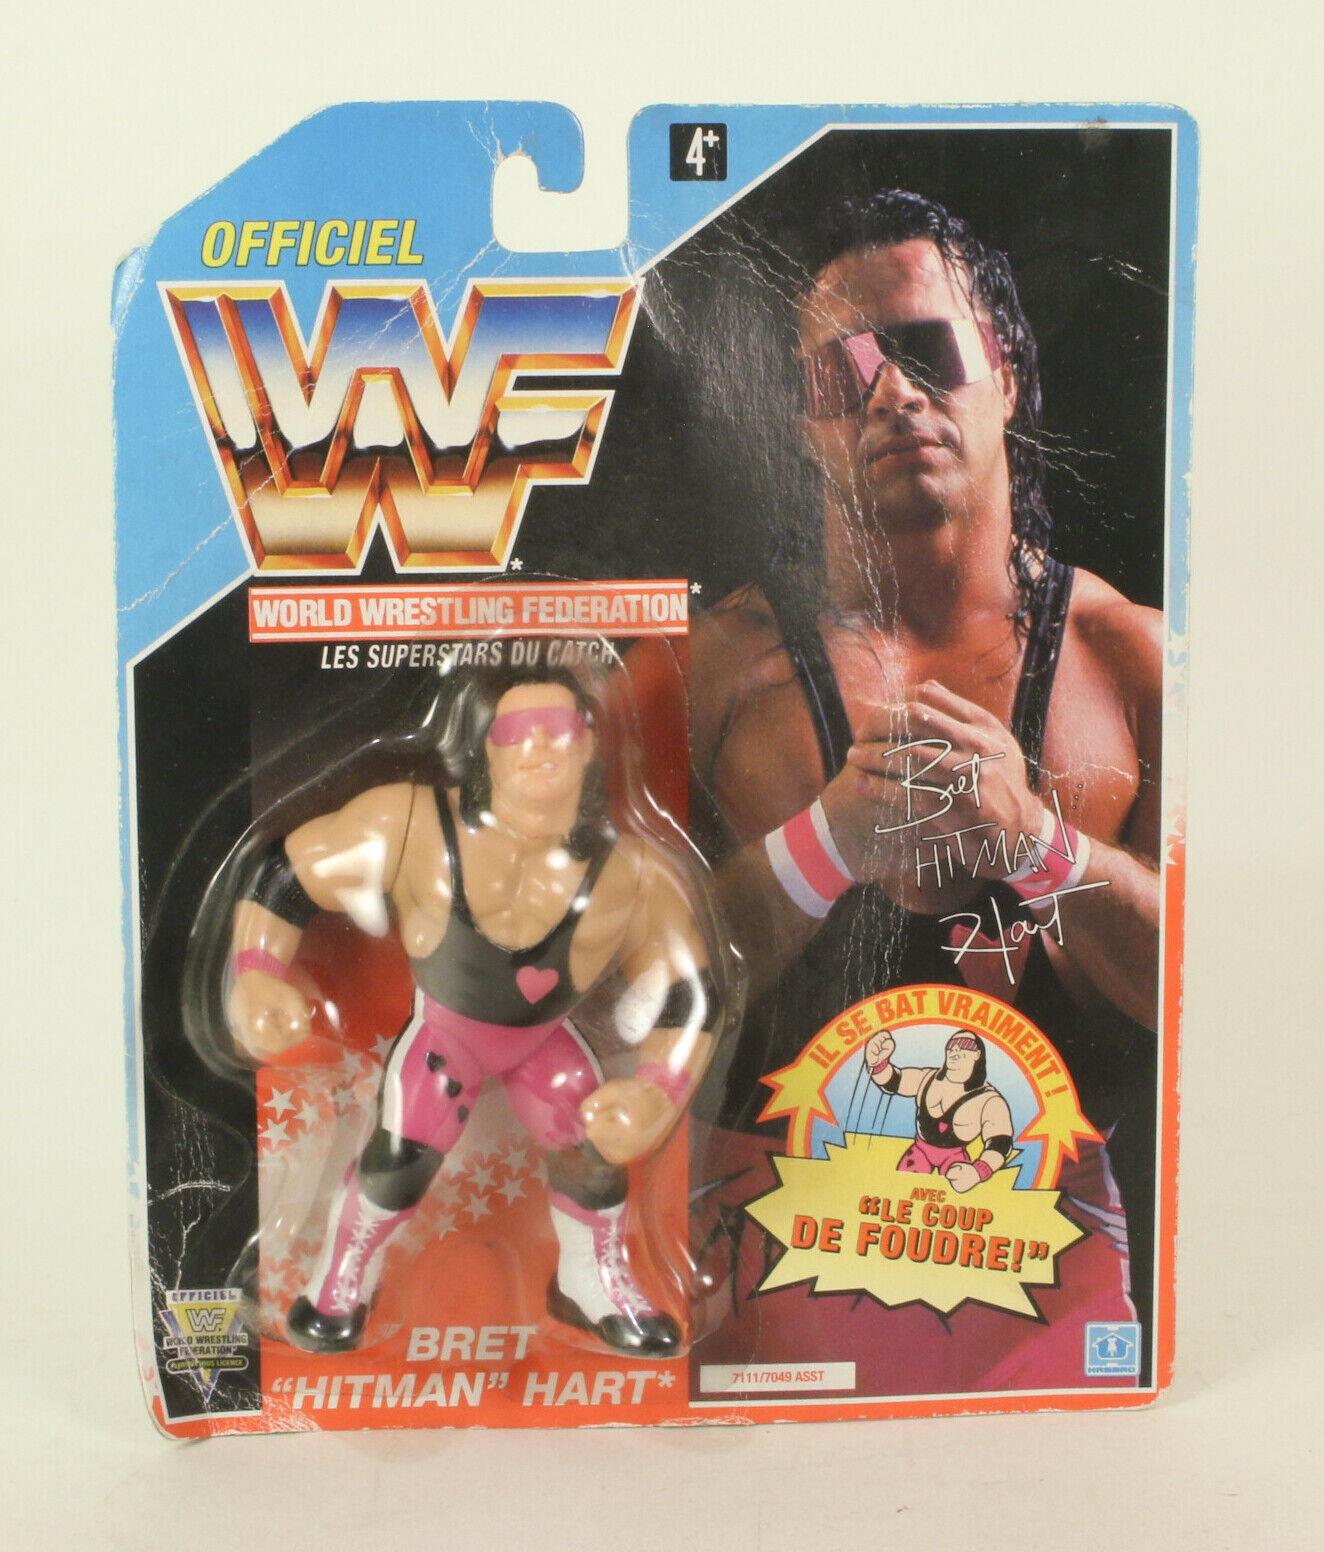 WWF Bret Hituomo Hart blu autoD Hasbro 1992 4.5 pollici WWE Wrestling